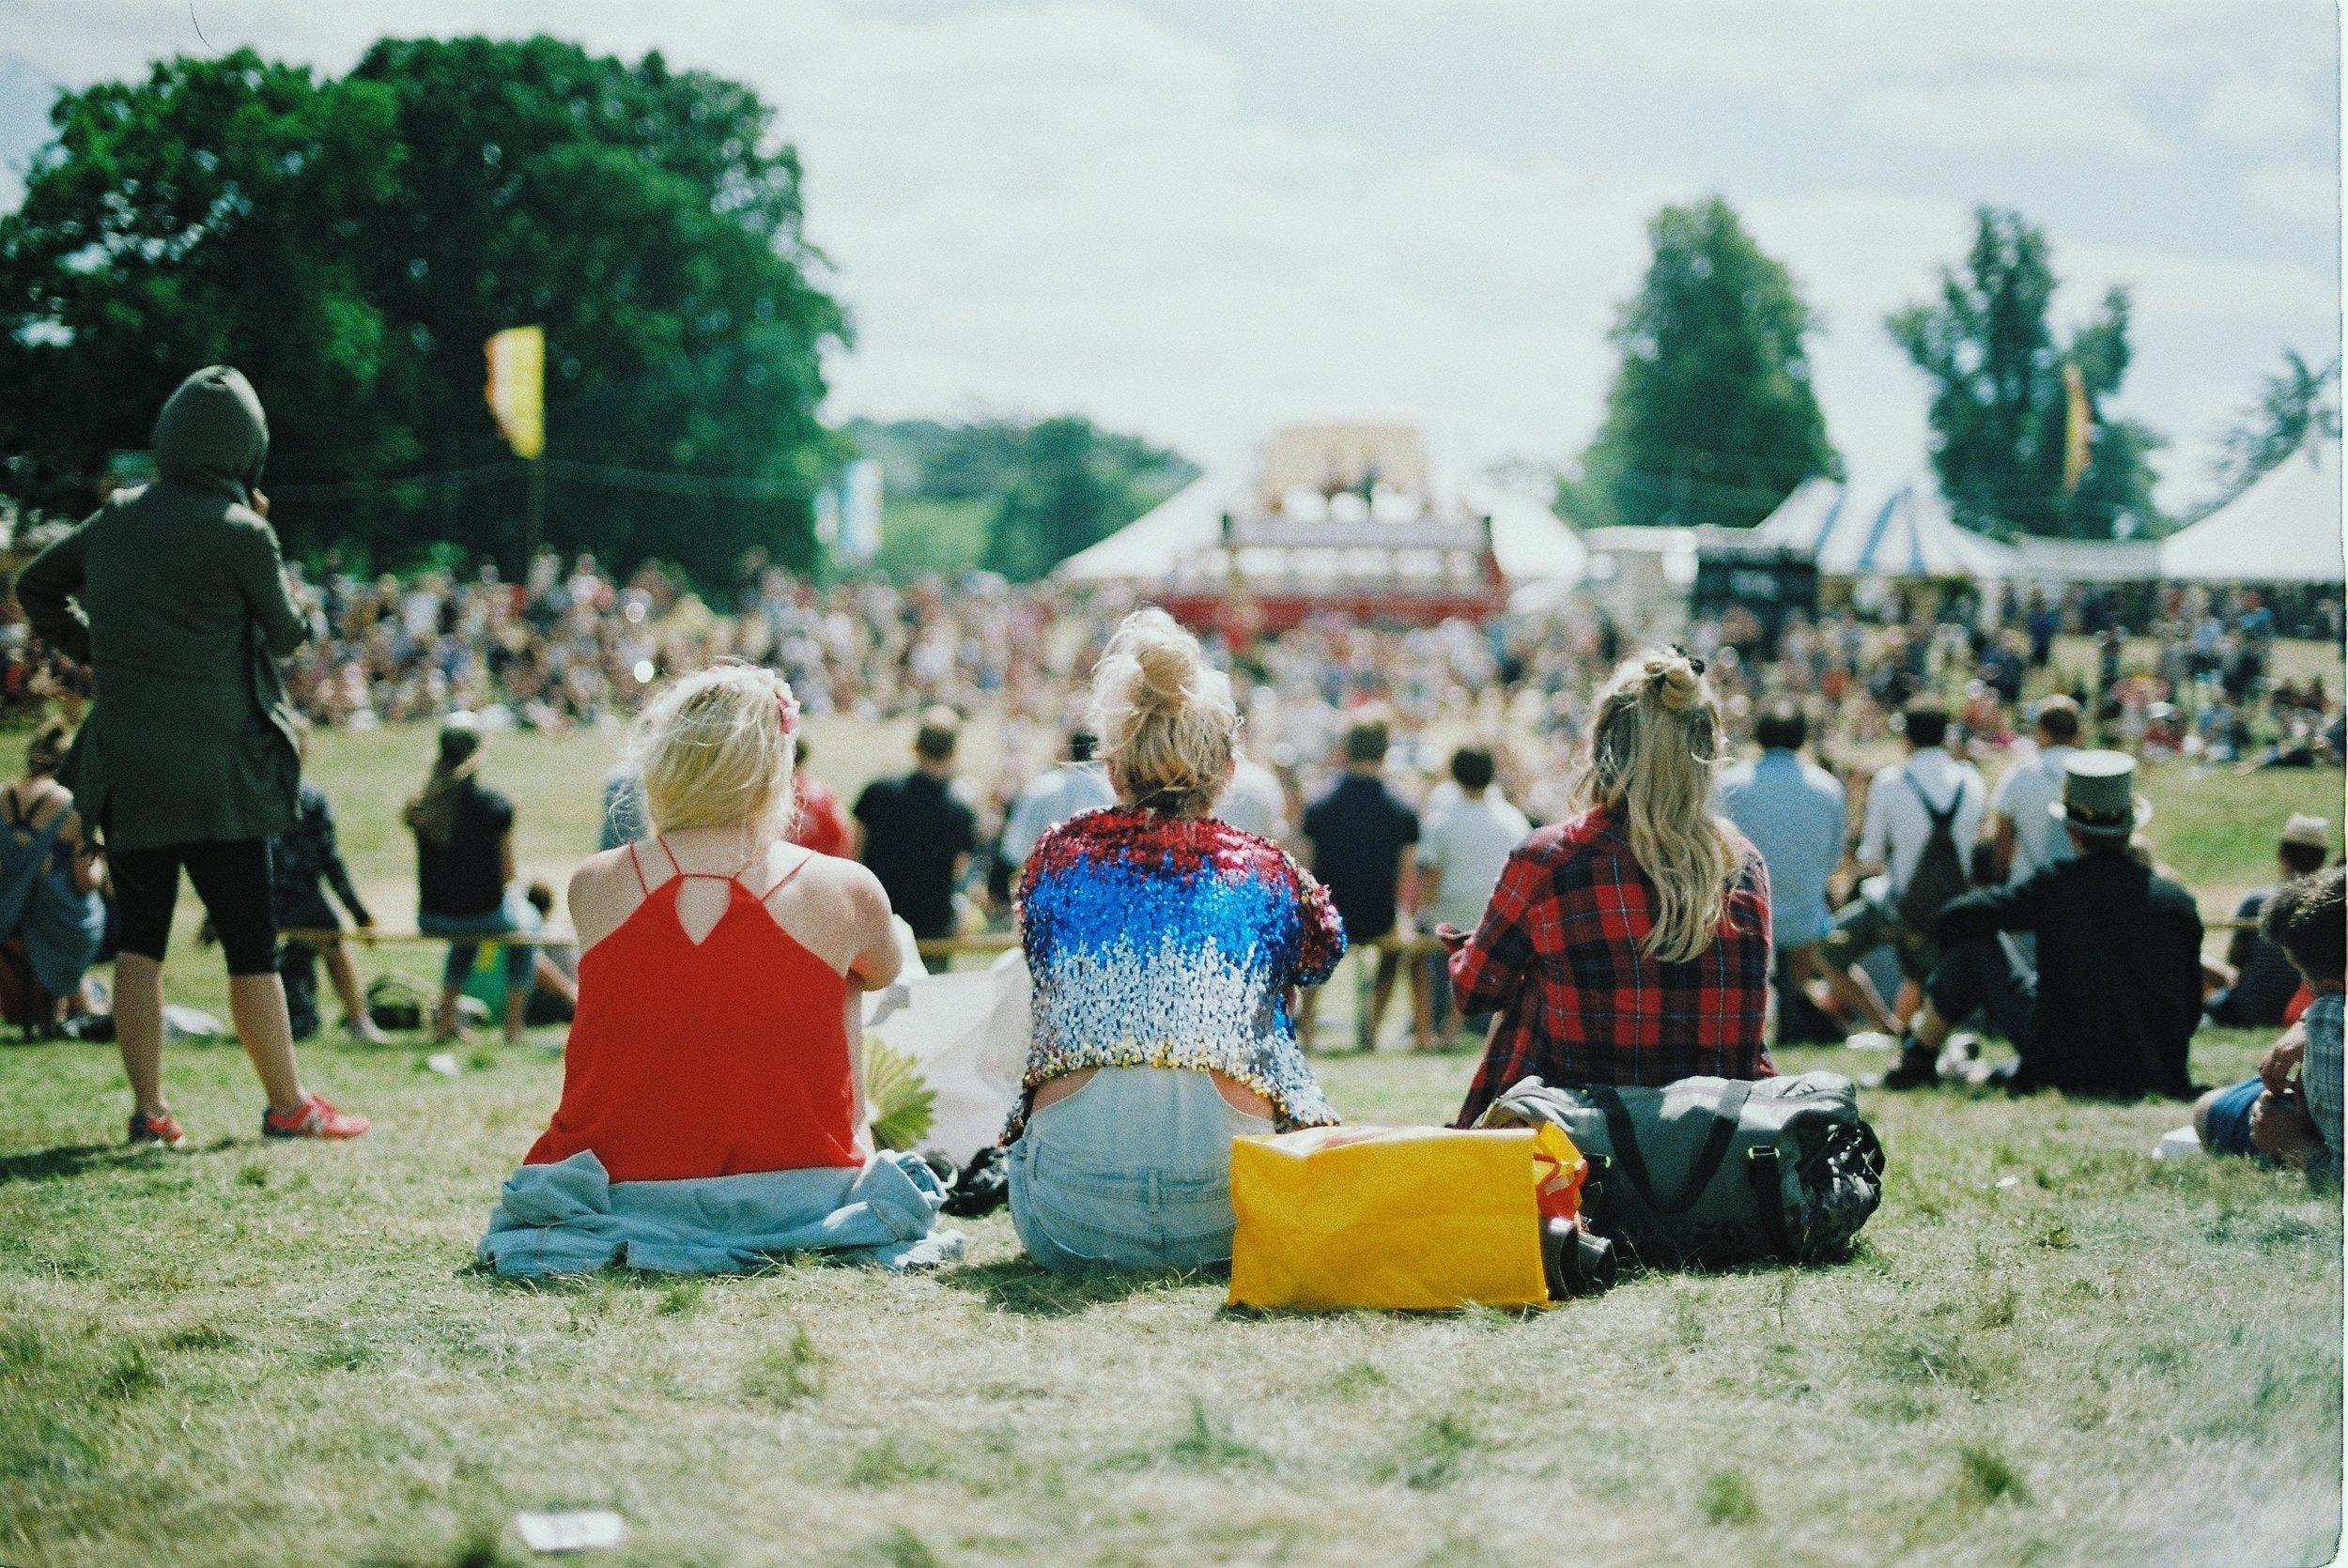 People at a festival near Tingdene Lifestyle Parks